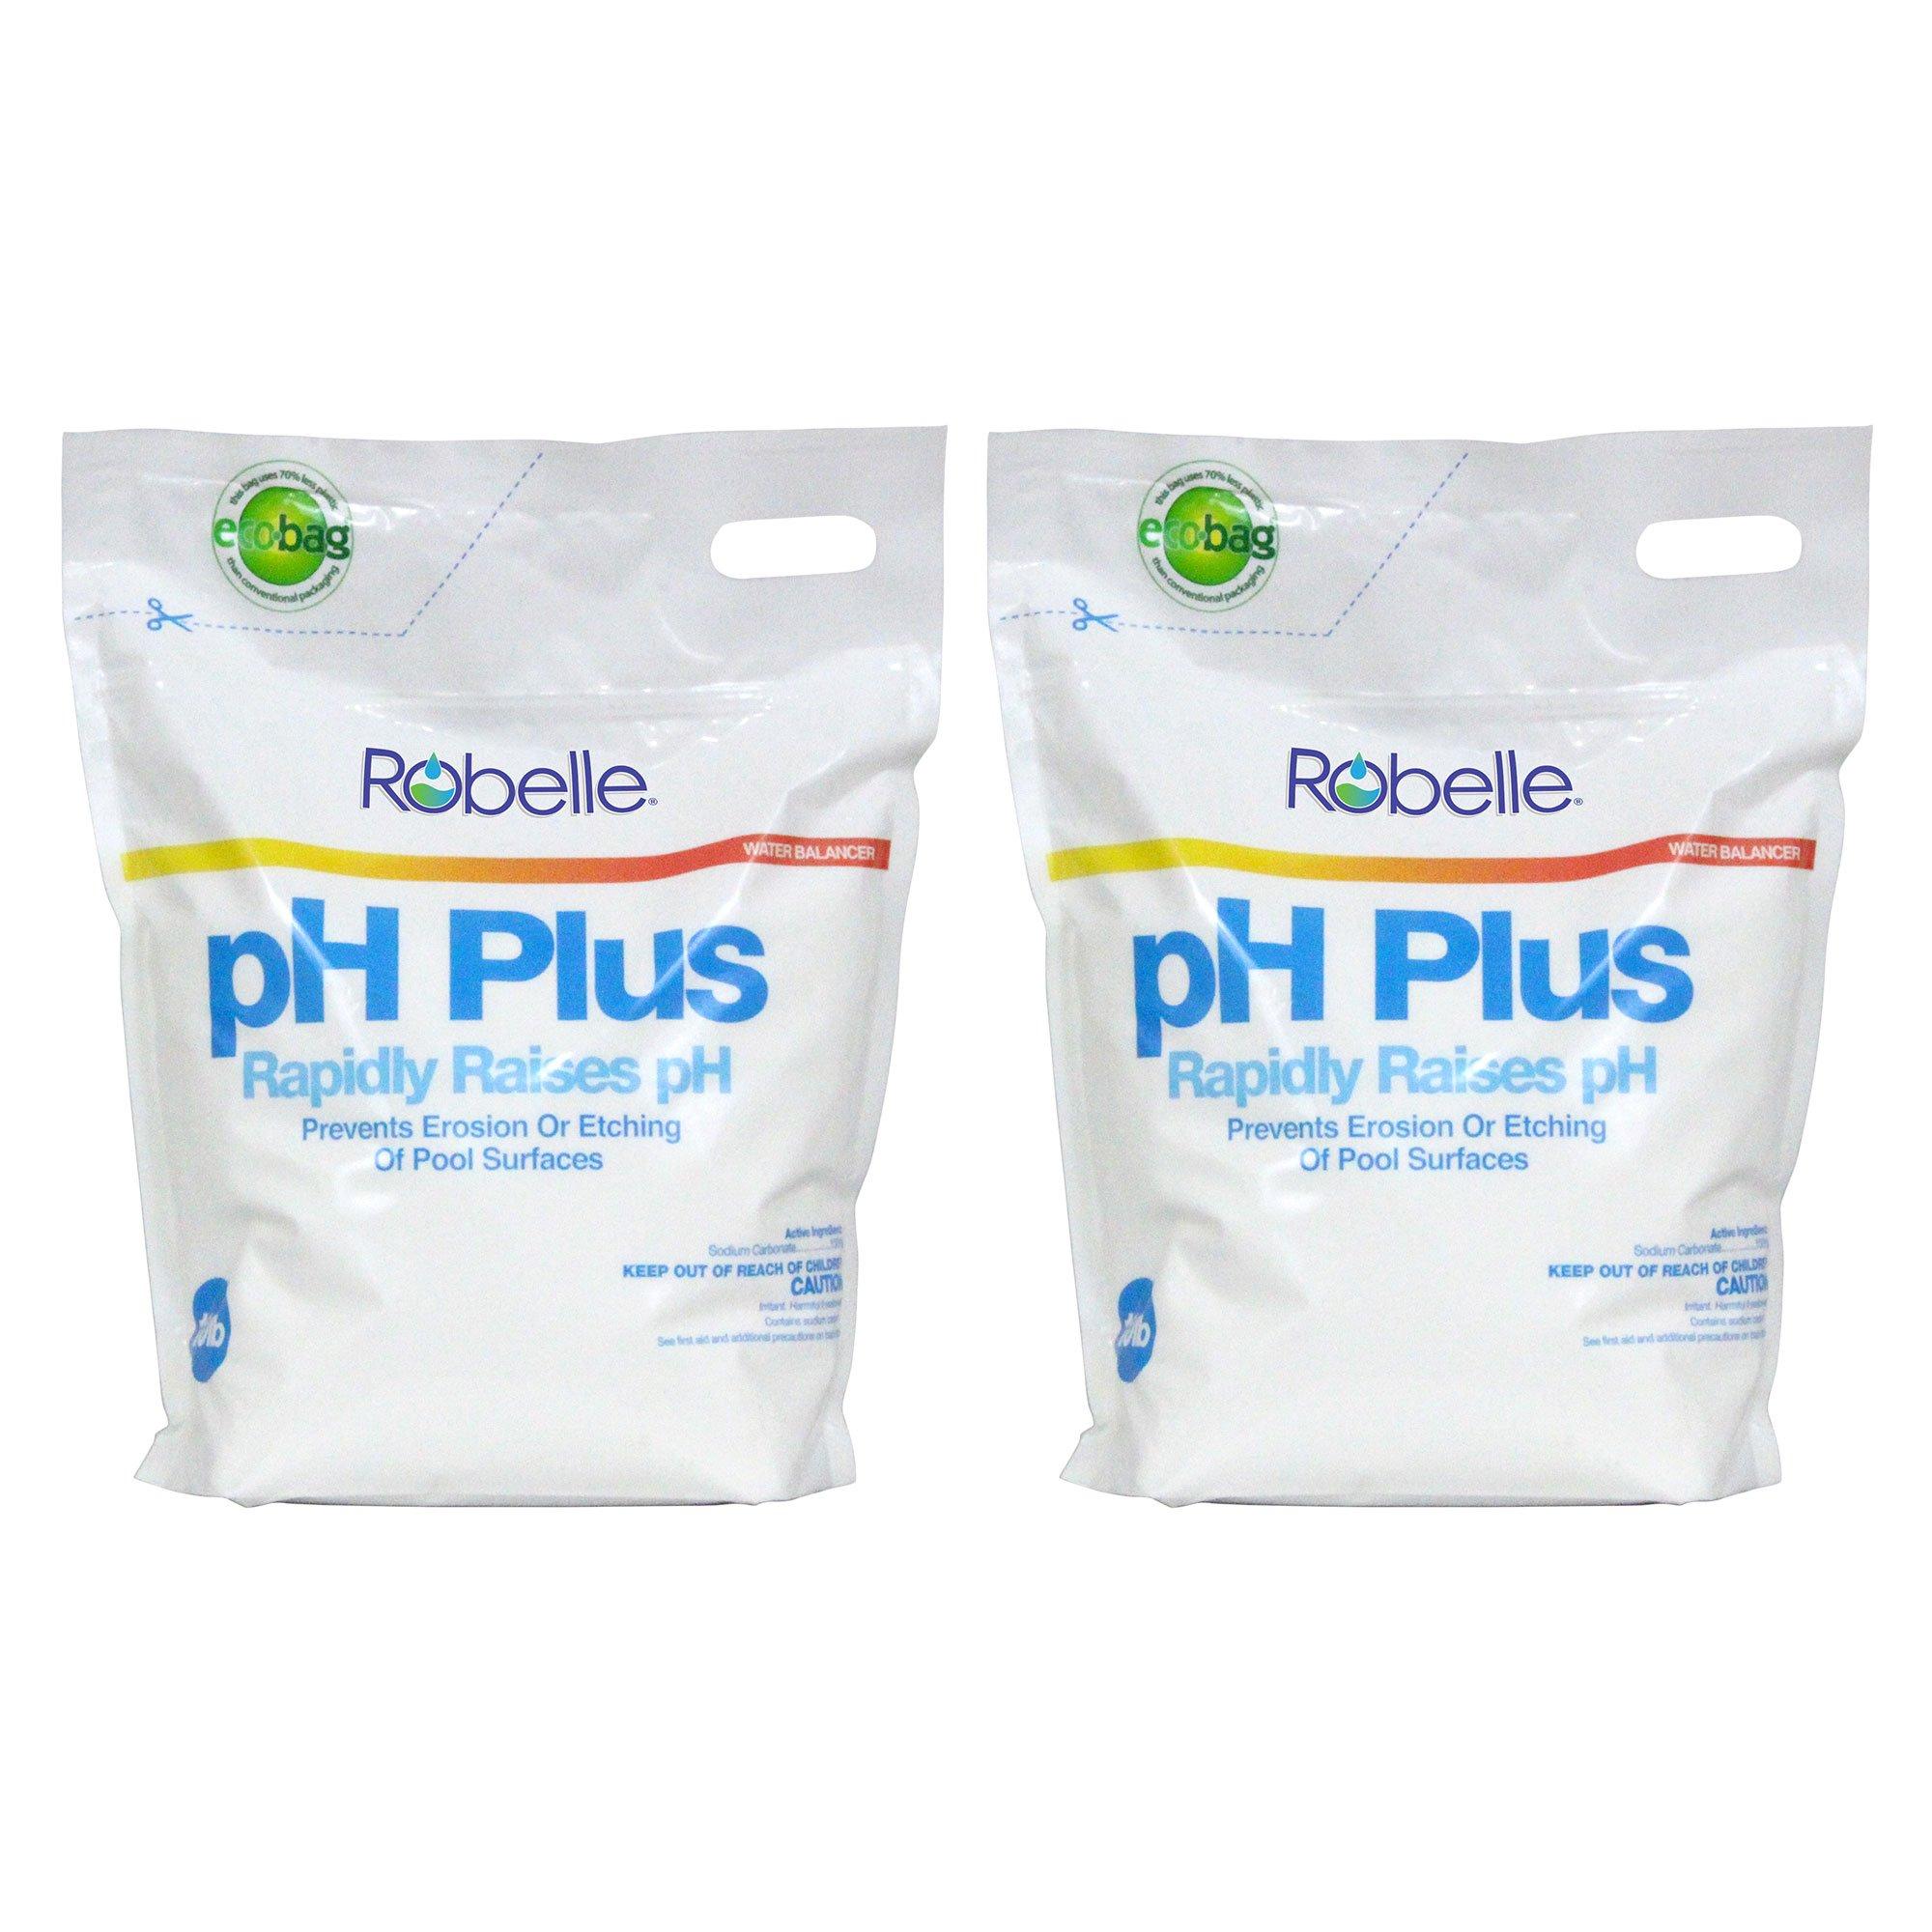 Robelle 2210B-02 pH Increaser for Swimming Pools, 20 lb by Robelle